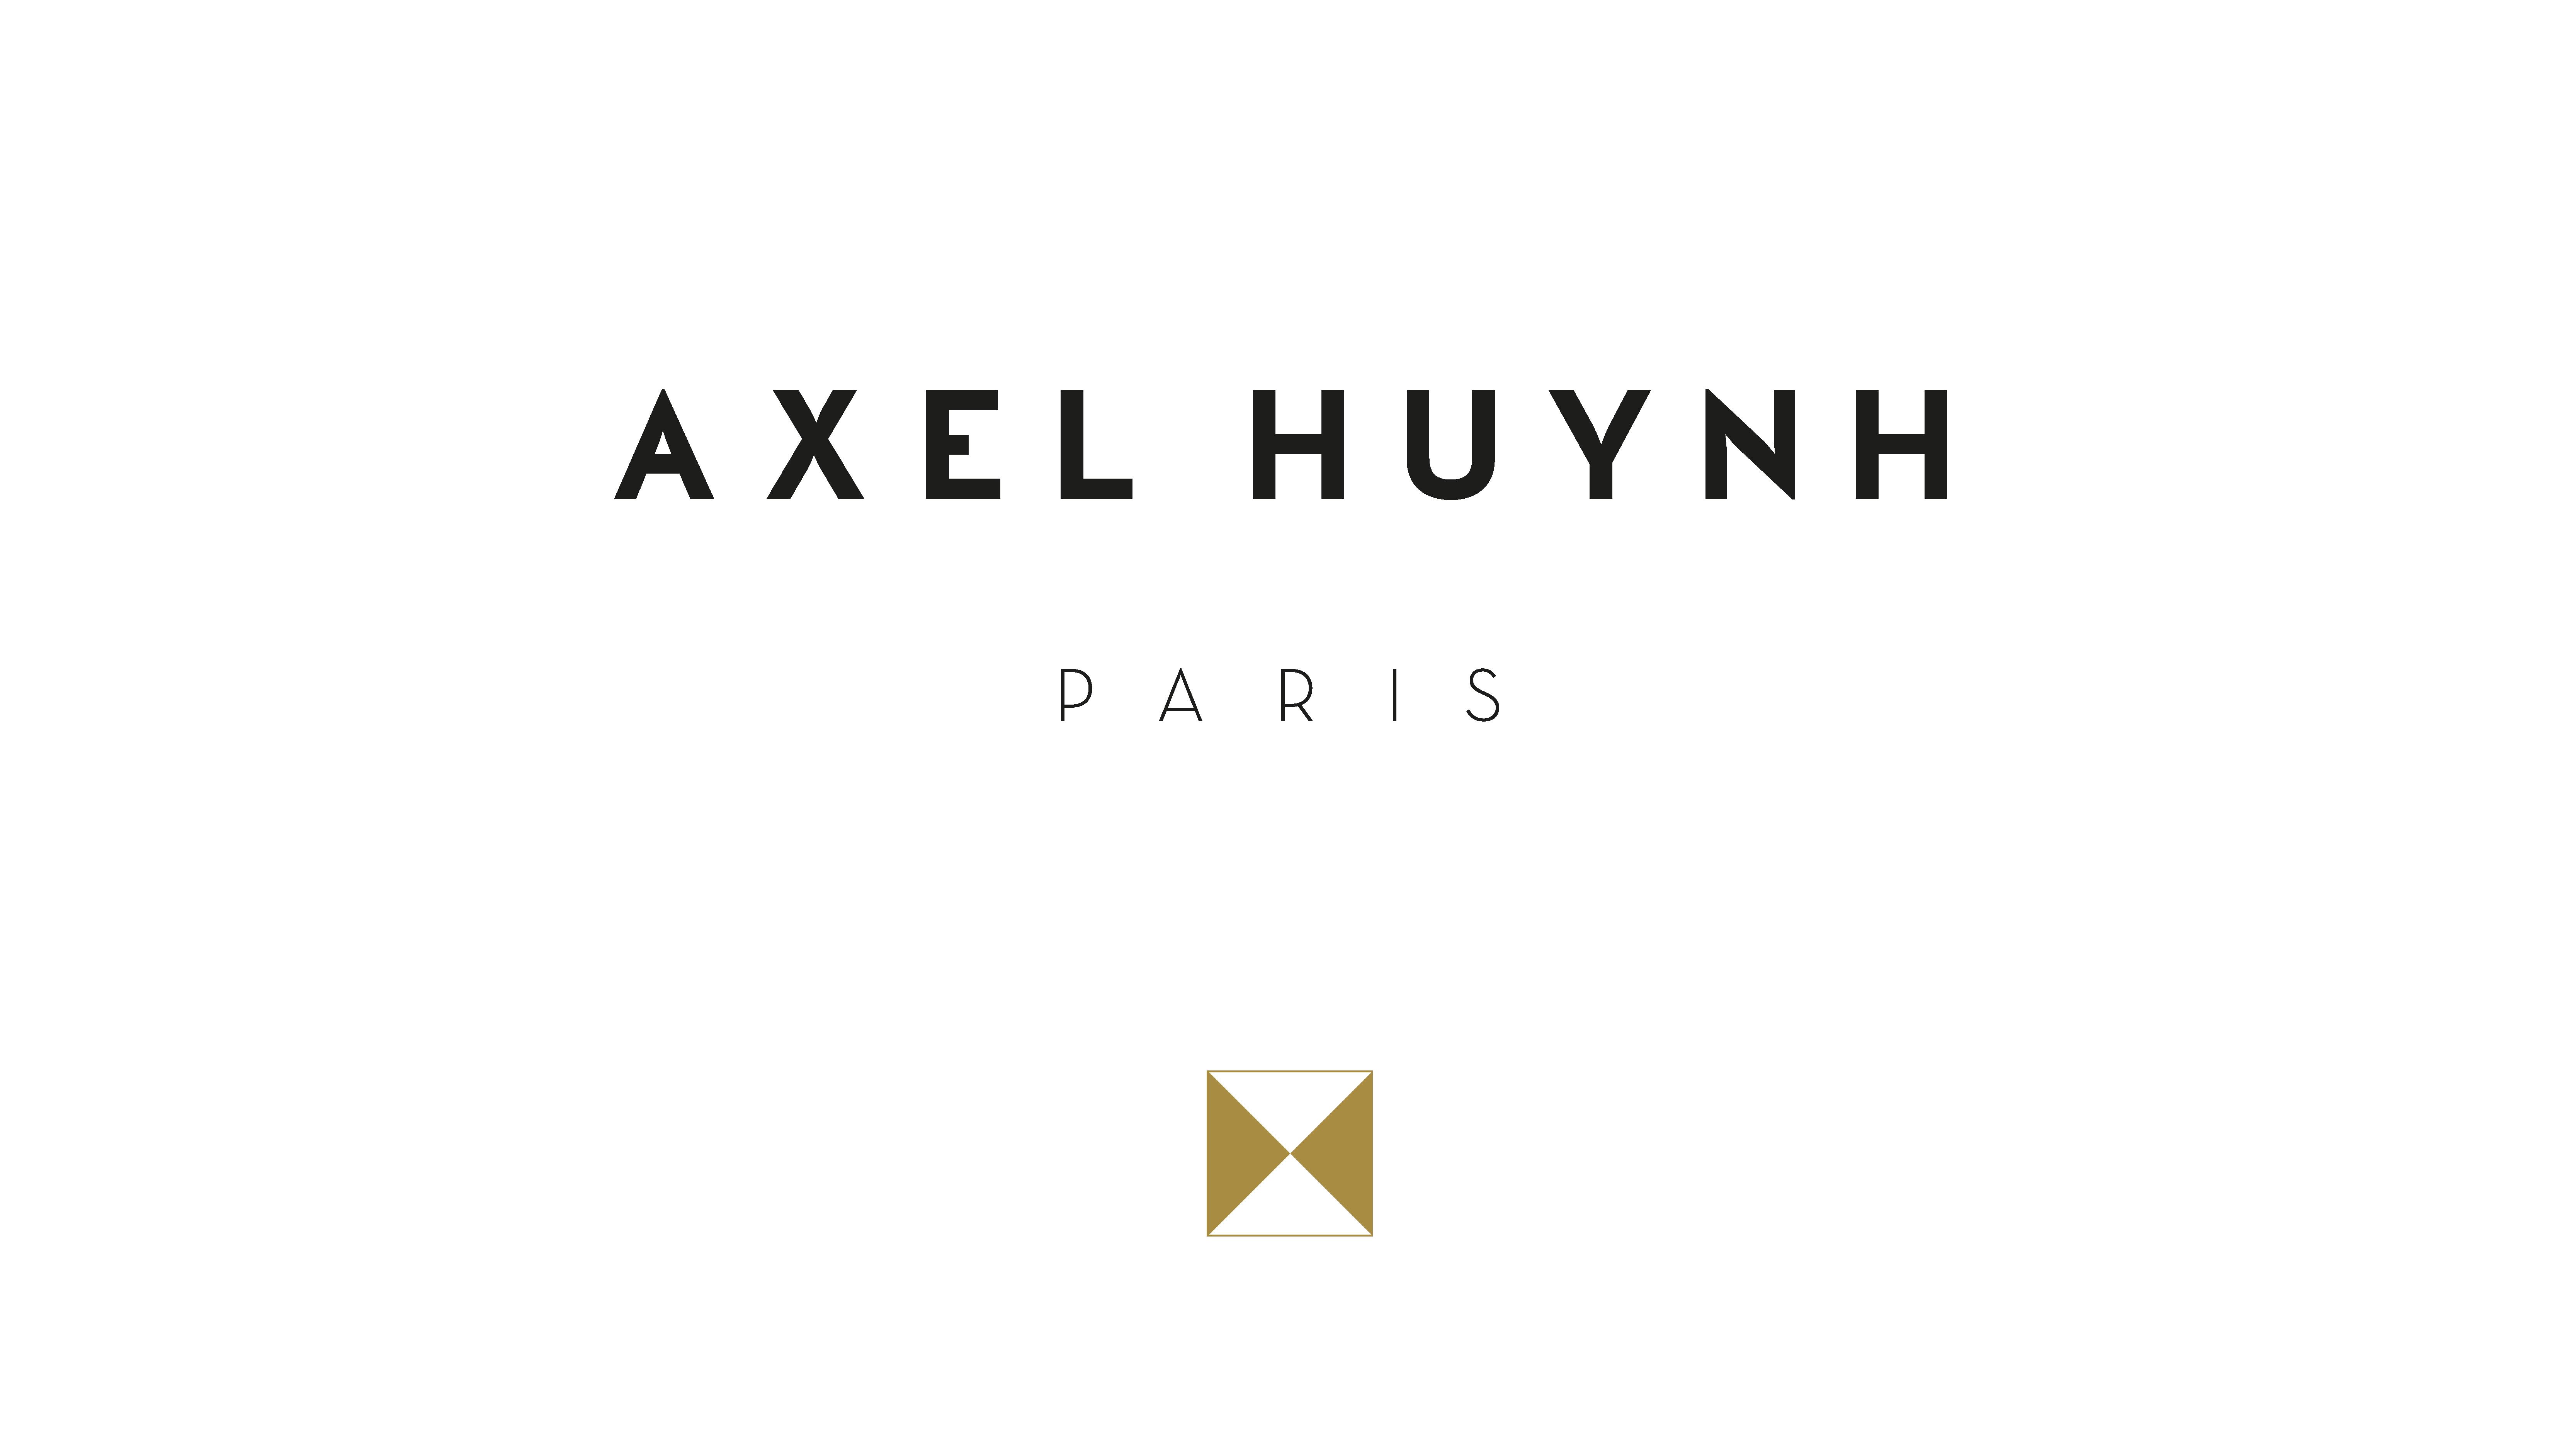 AXEL_HUYNH_PARIS_BRAND_IDENTITY_LOGOTYPE_ORIGINAL_169_BLACK_TRANSPARENT